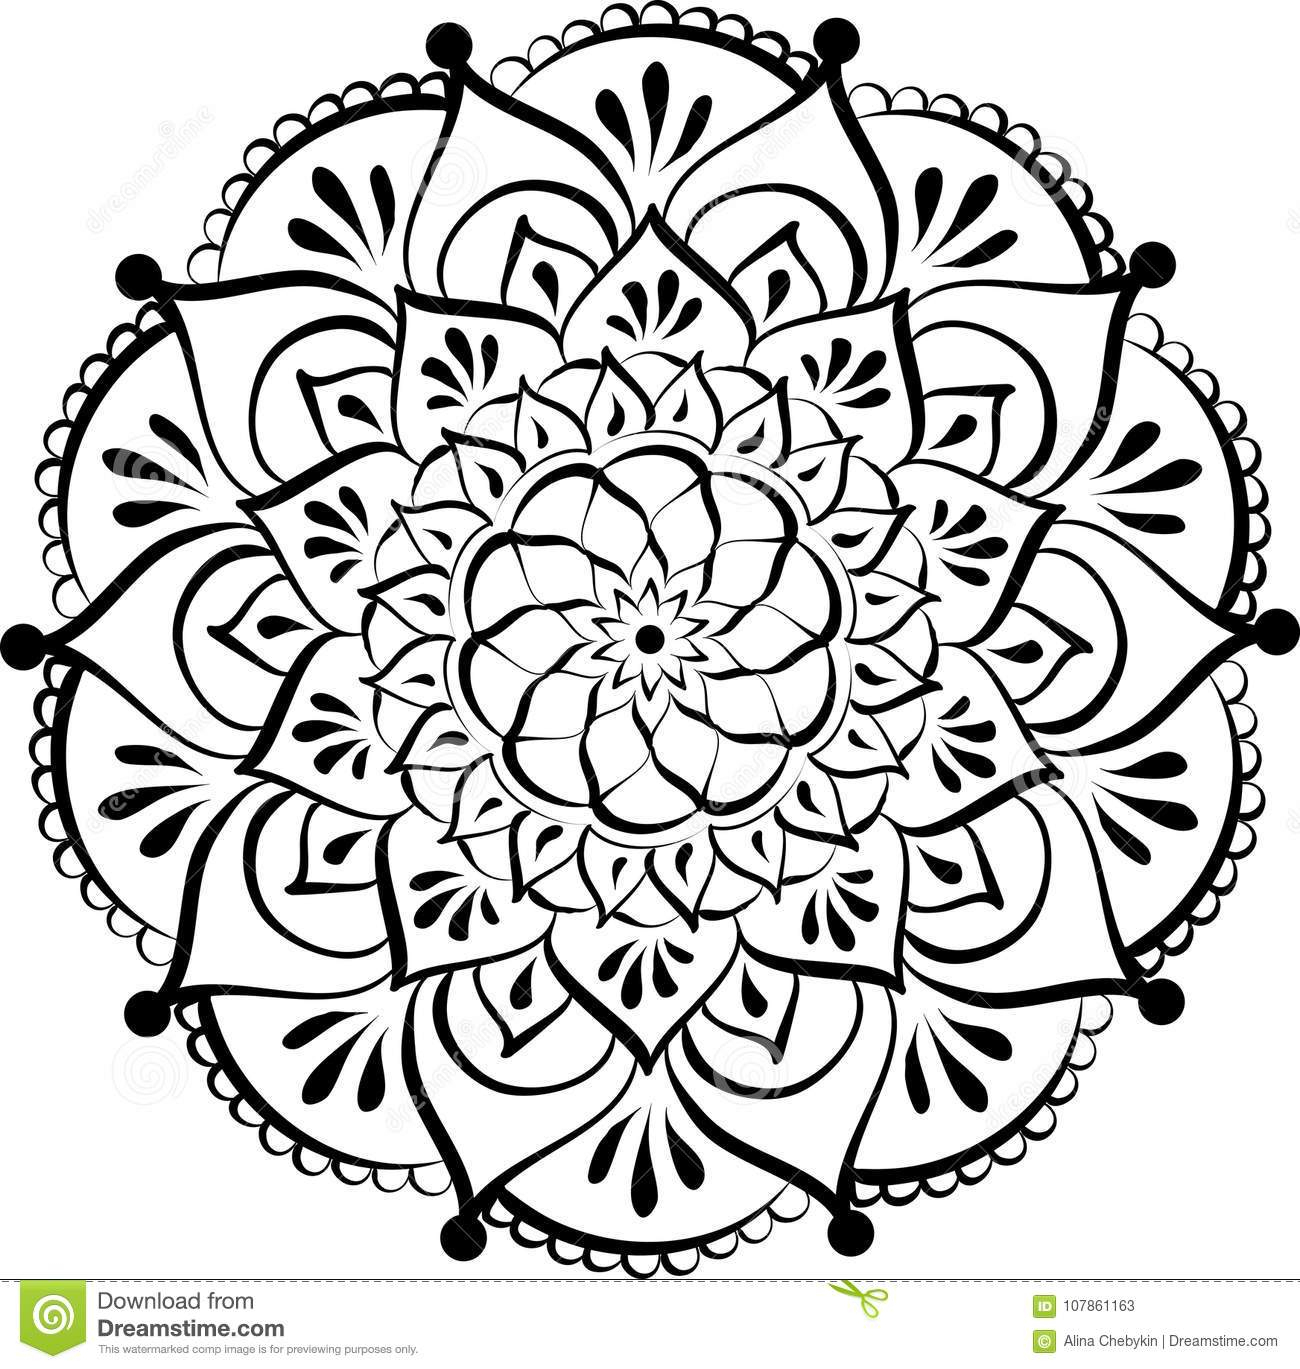 Dessin De Mandala Rond Floral De Dentelle Illustration De à Dessiner Un Mandala